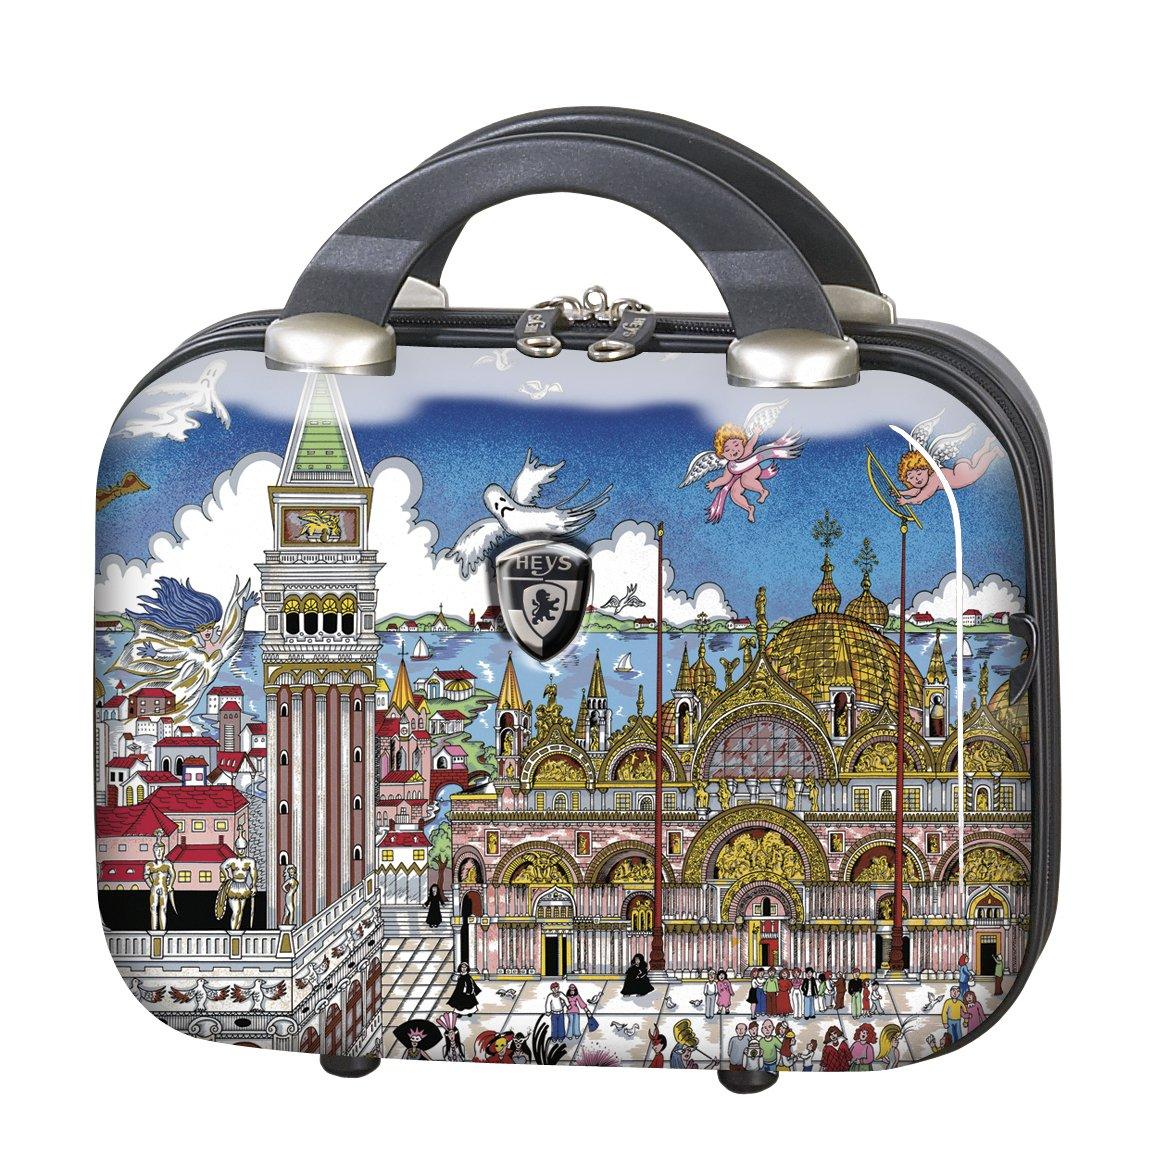 Heys – Künstler Fazzino Venezia Handgepäck Beauty Case bestellen